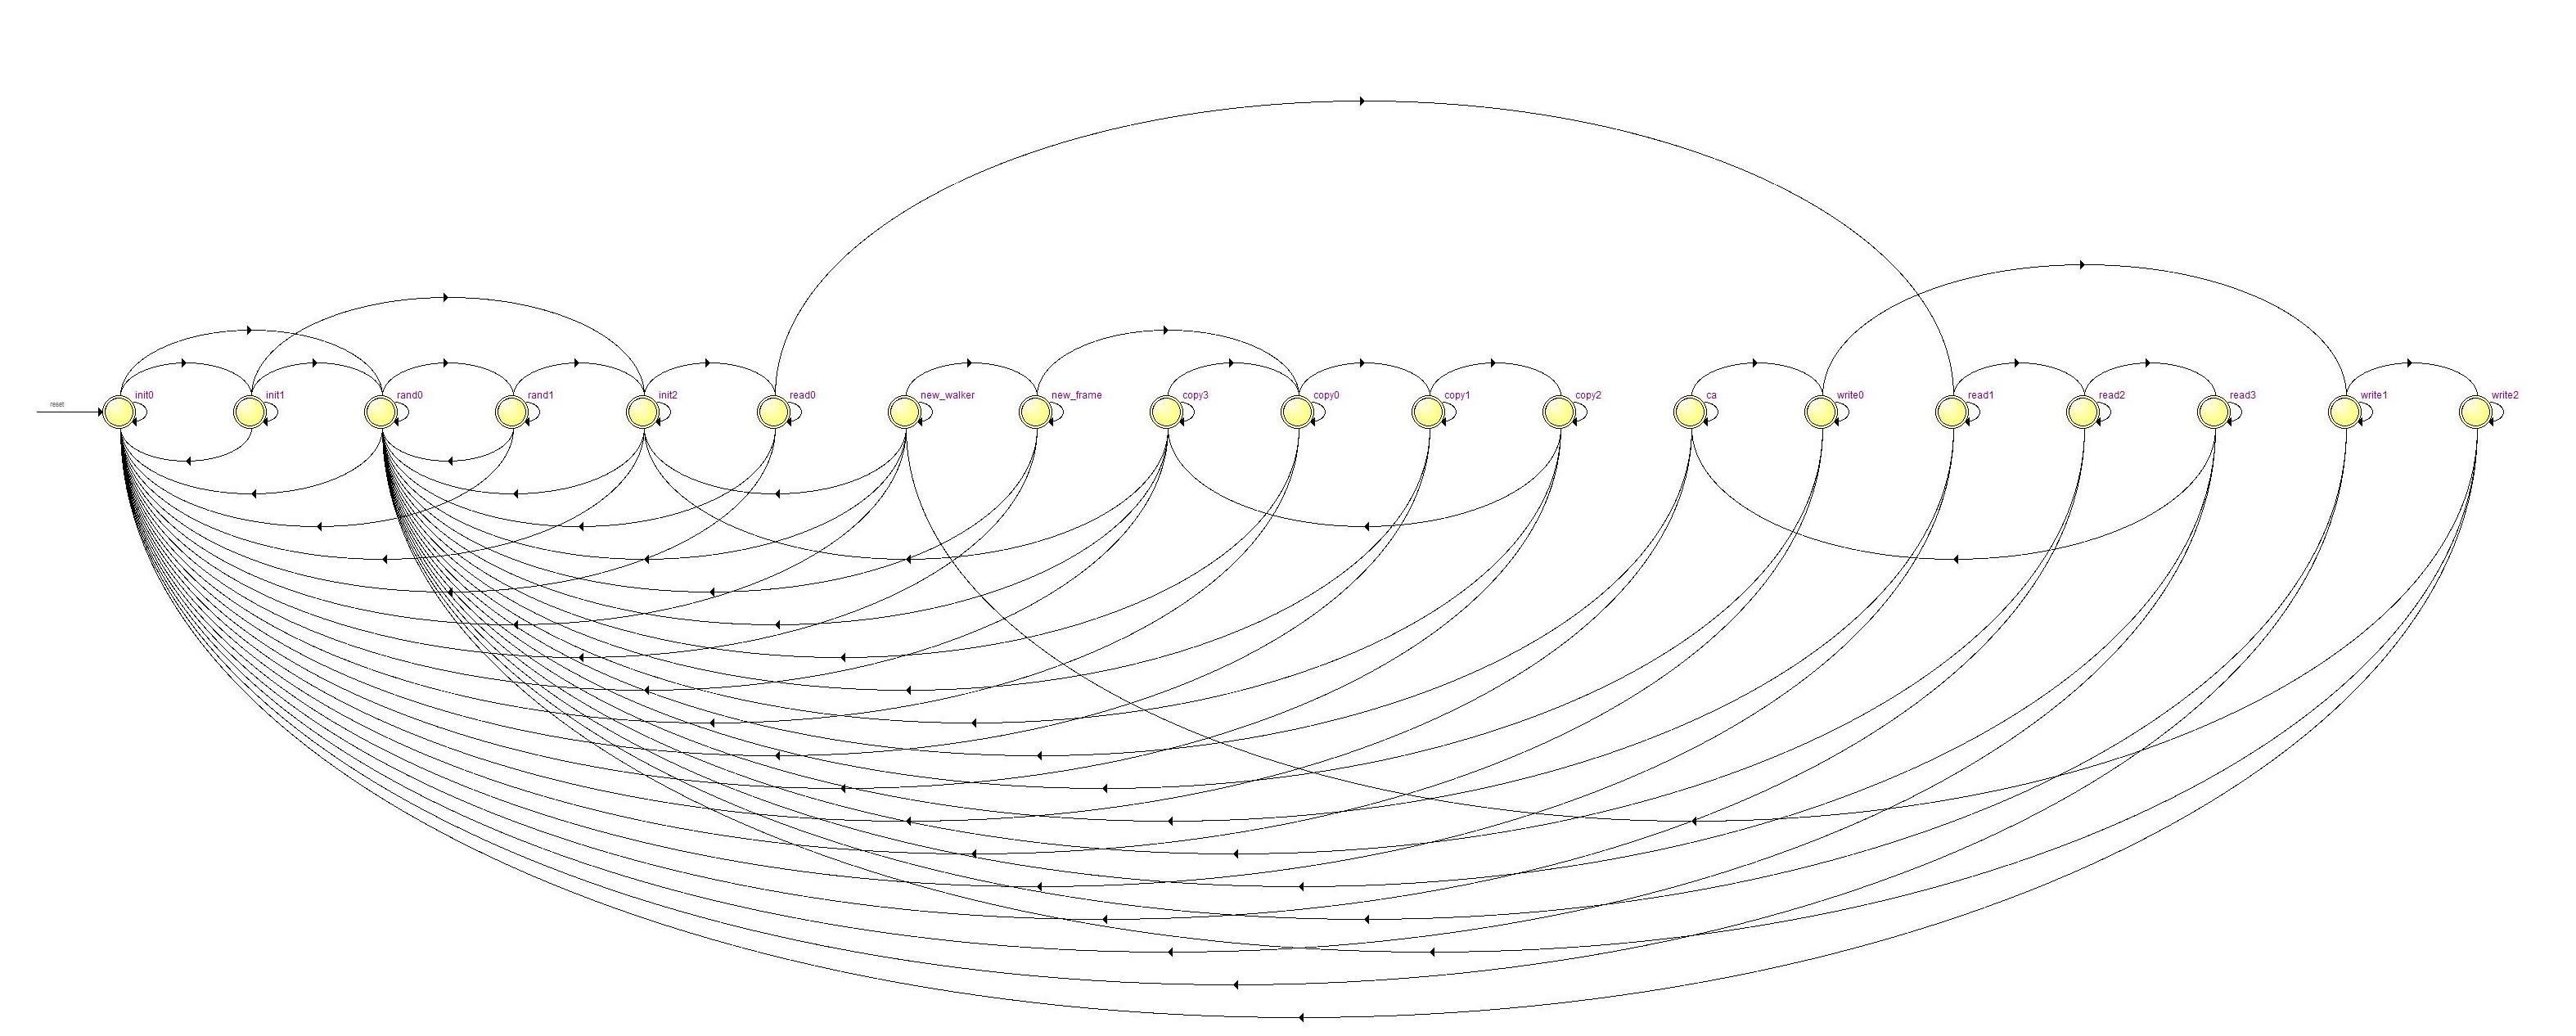 1 Dimensional Cellular Automata